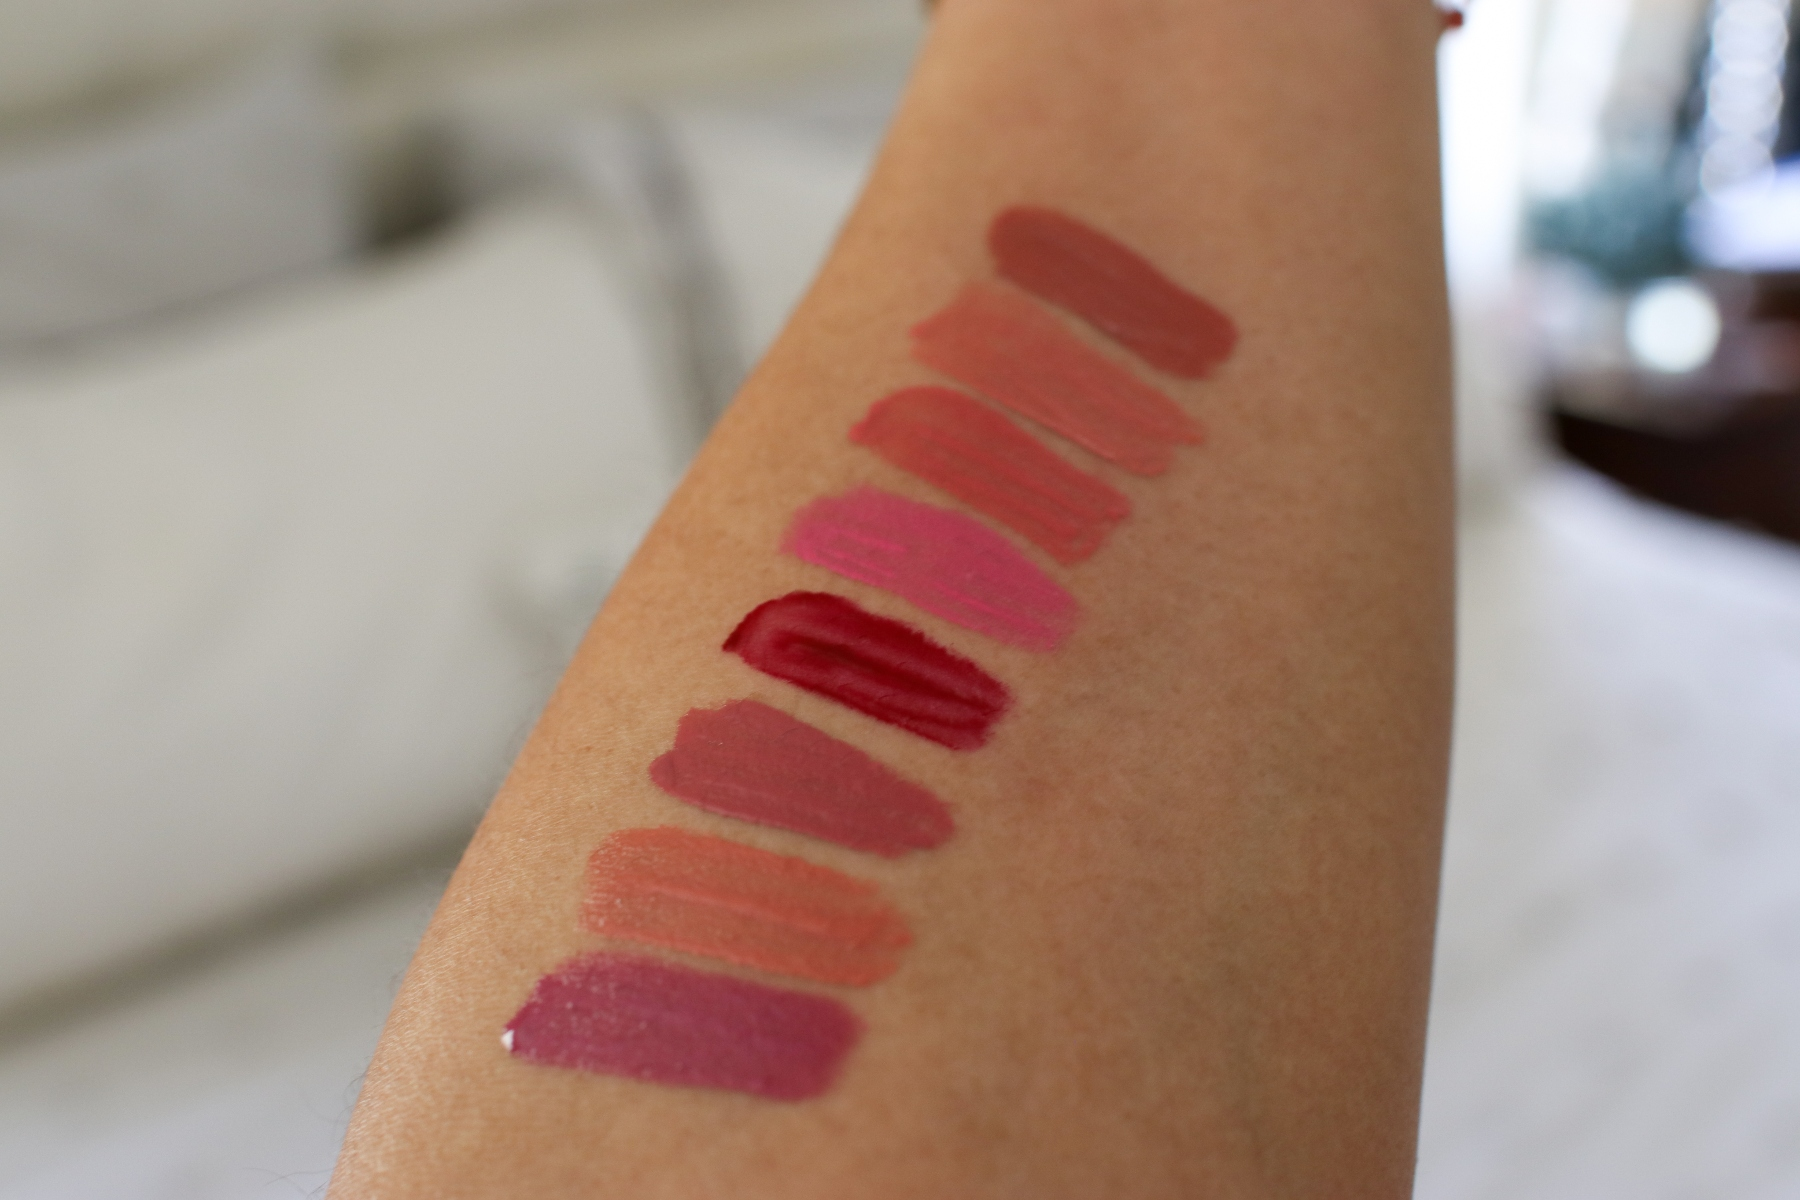 LipLocked Lip Stain by Manna Kadar - Lip Gloss - Debbie Savage